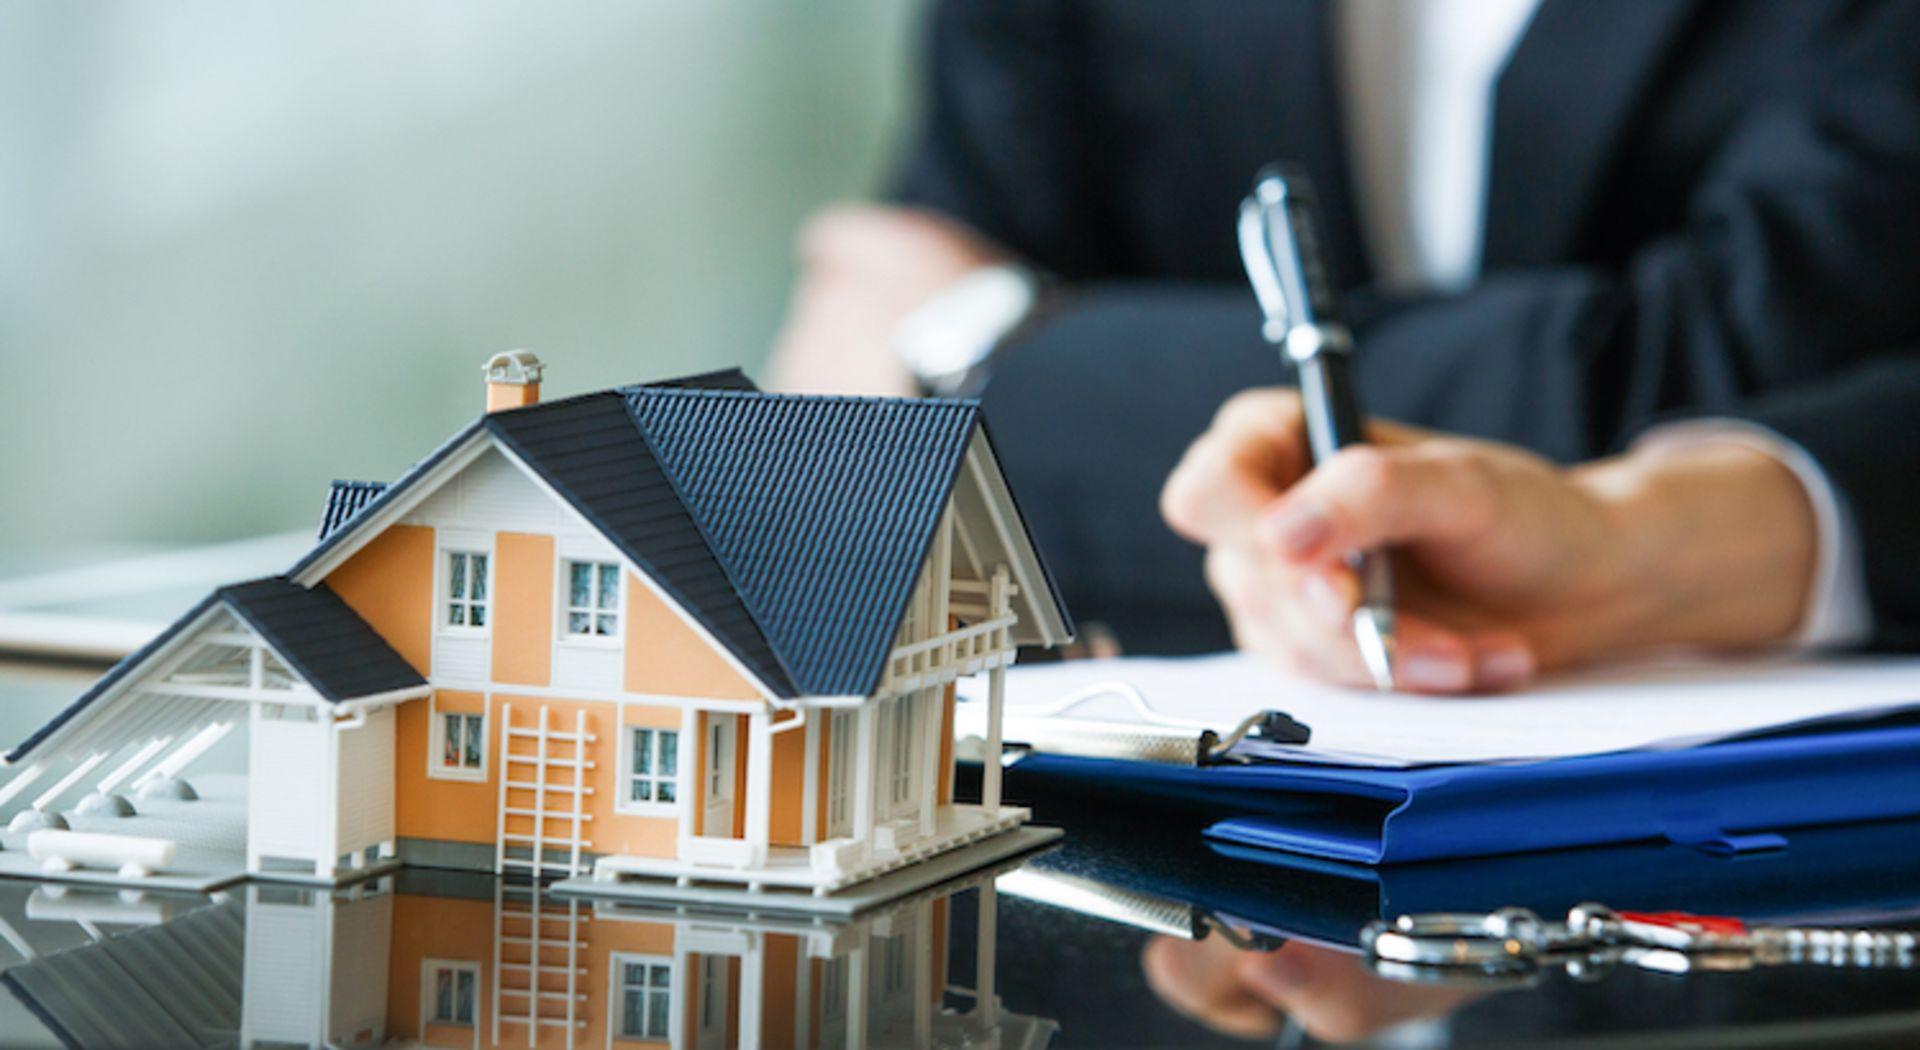 5 First-time Homebuyer PITFALLS